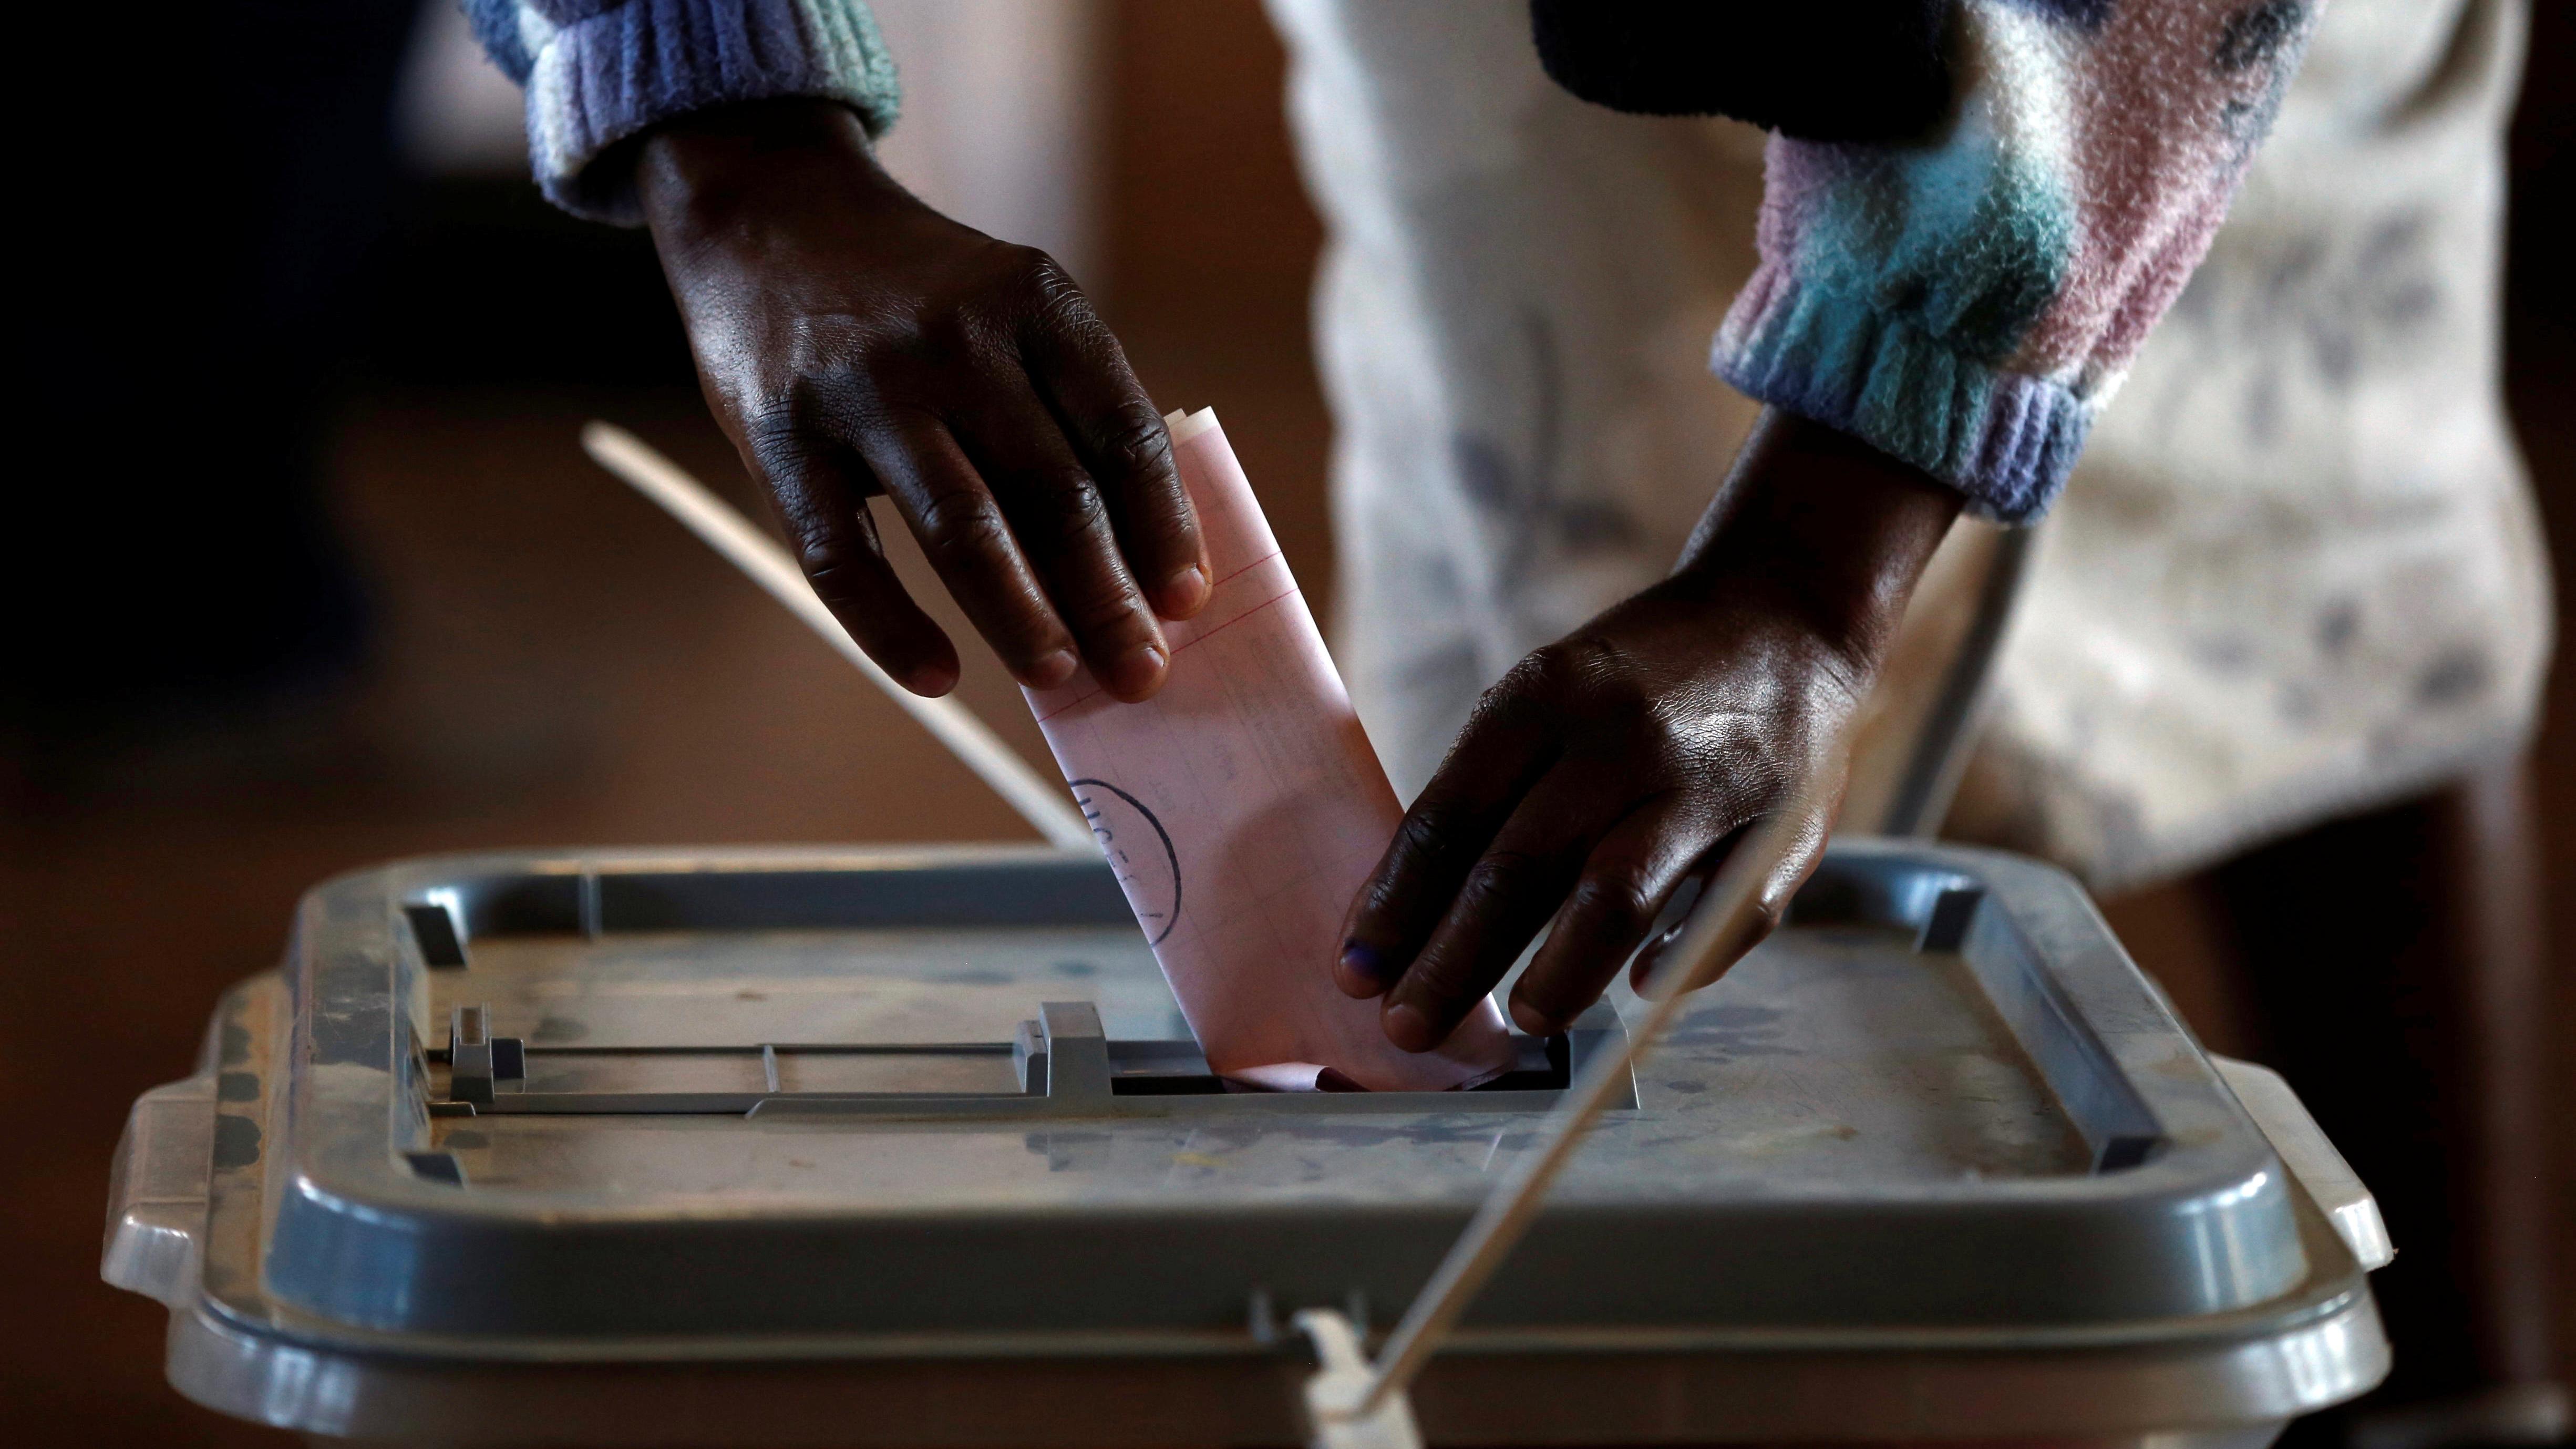 A woman casts her ballot during the national elections at Ha-Mampho Village outside the capital Maseru, Lesotho June 3, 2017. REUTERS/Siphiwe Sibeko - RTX38TSL